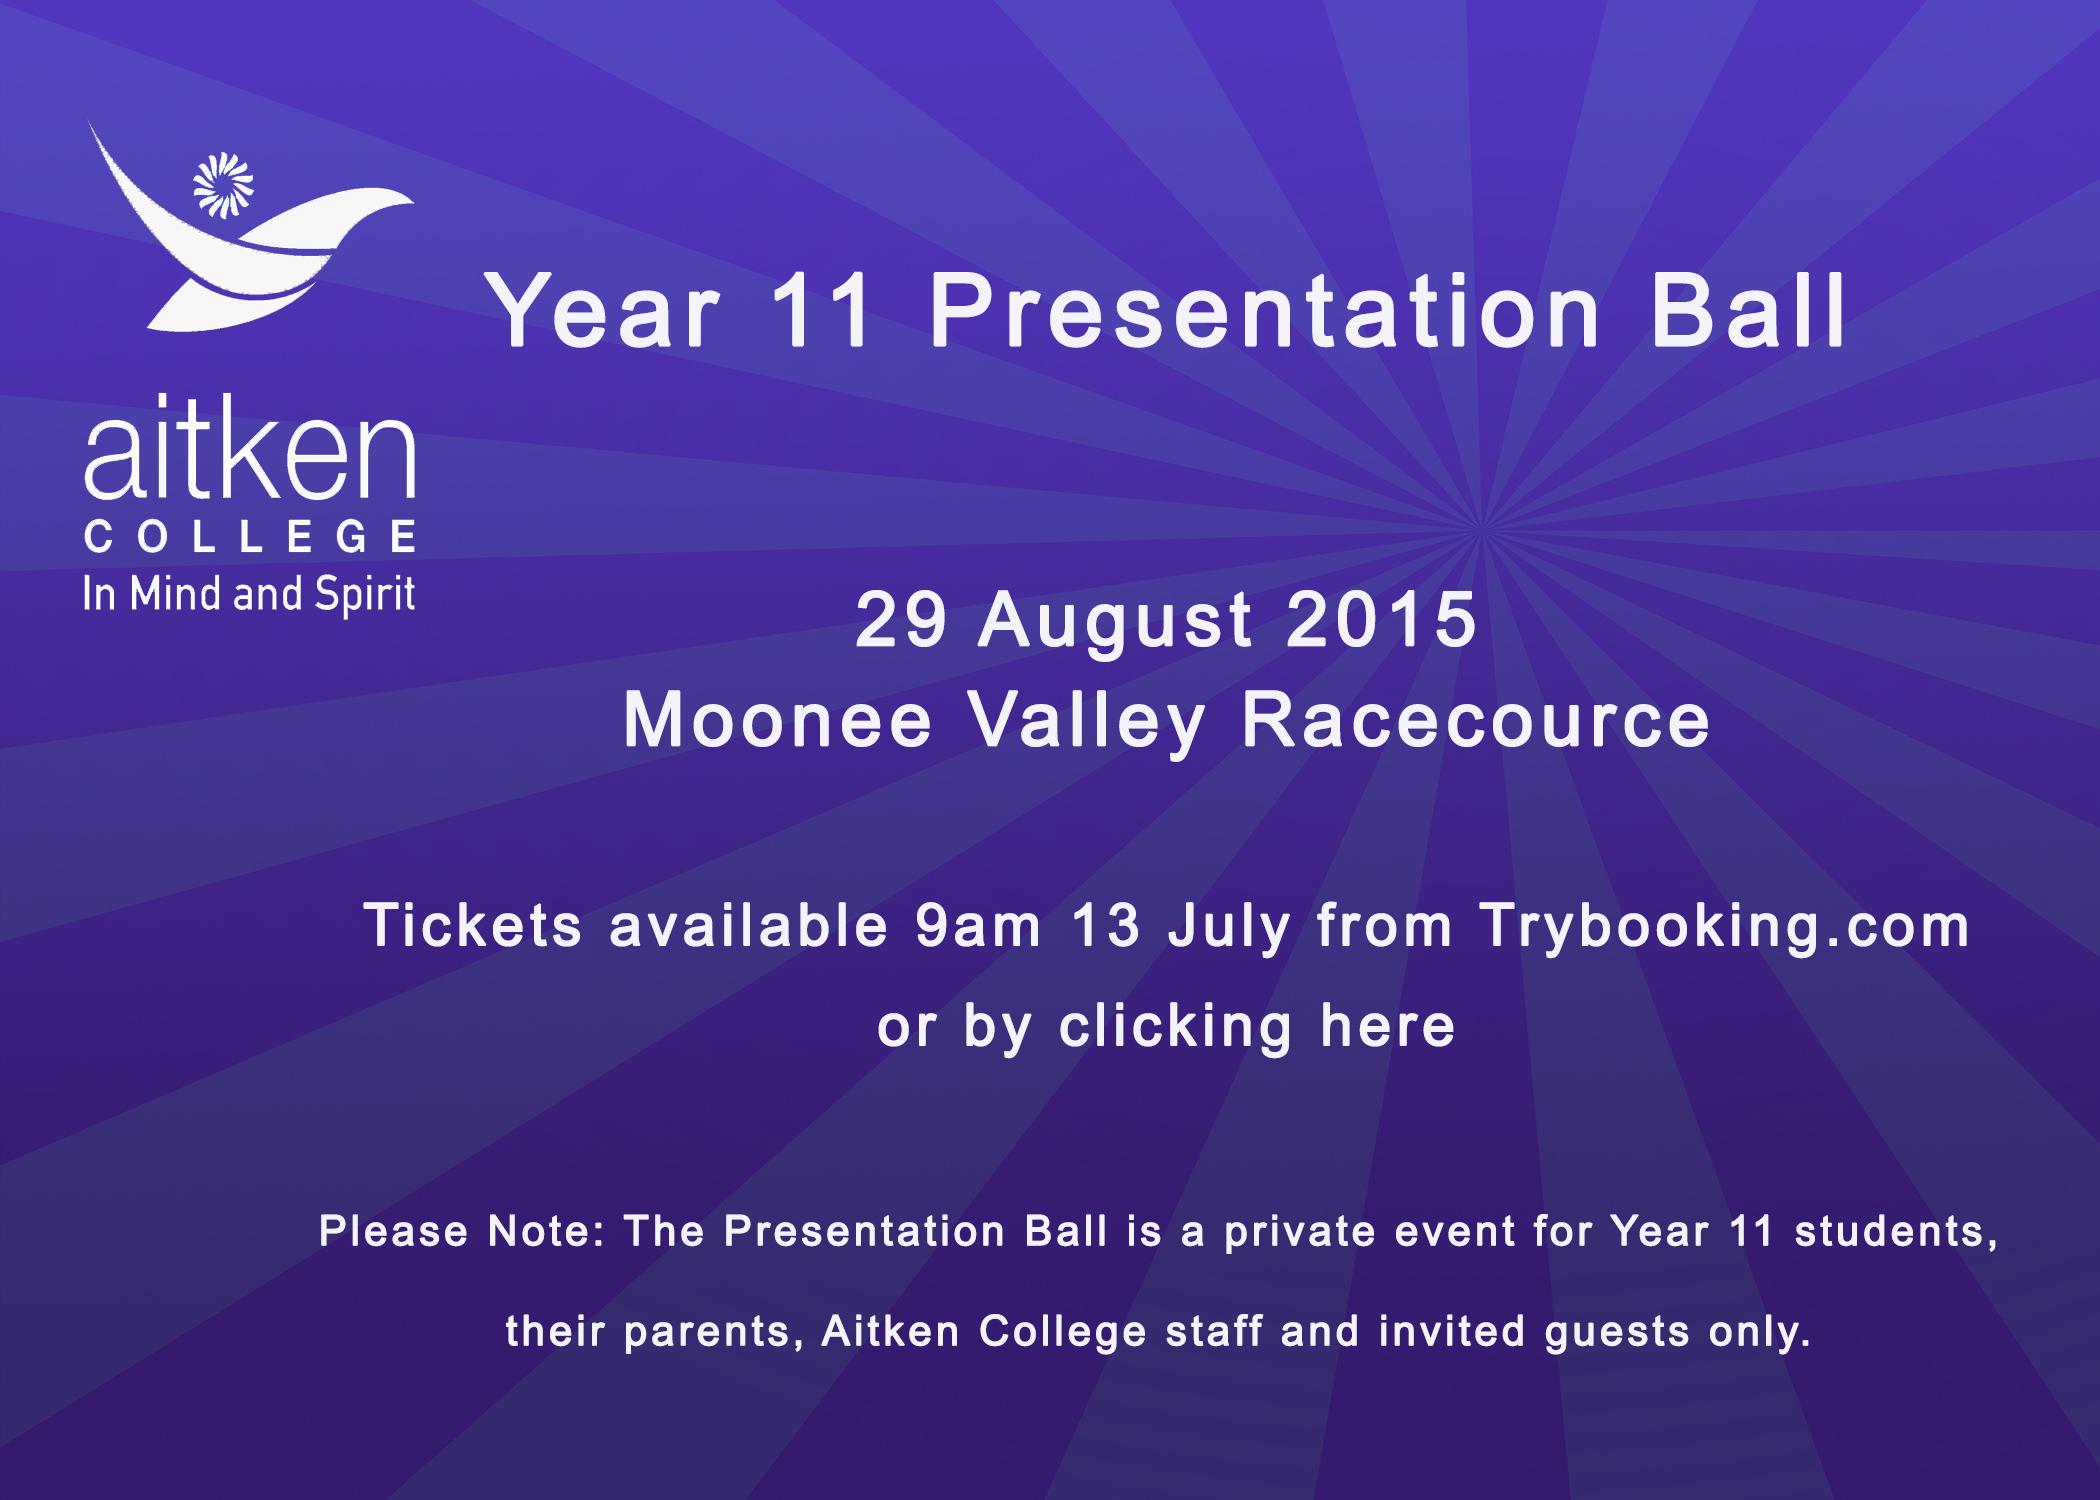 Presentation Ball